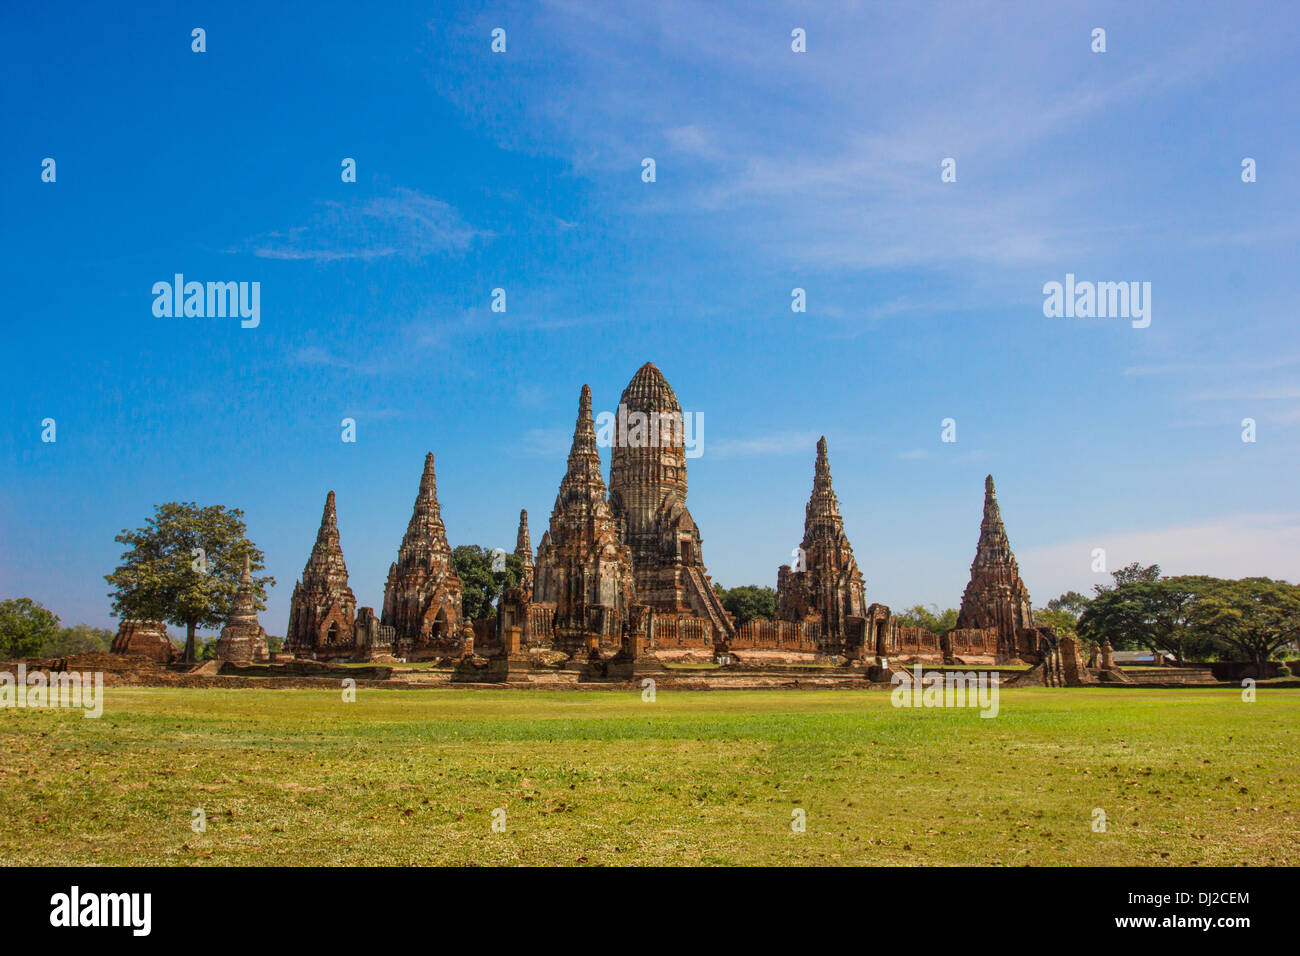 Wat Chaiwatthanaram,Tem ple of Ayutthaya Historical, Thailand - Stock Image